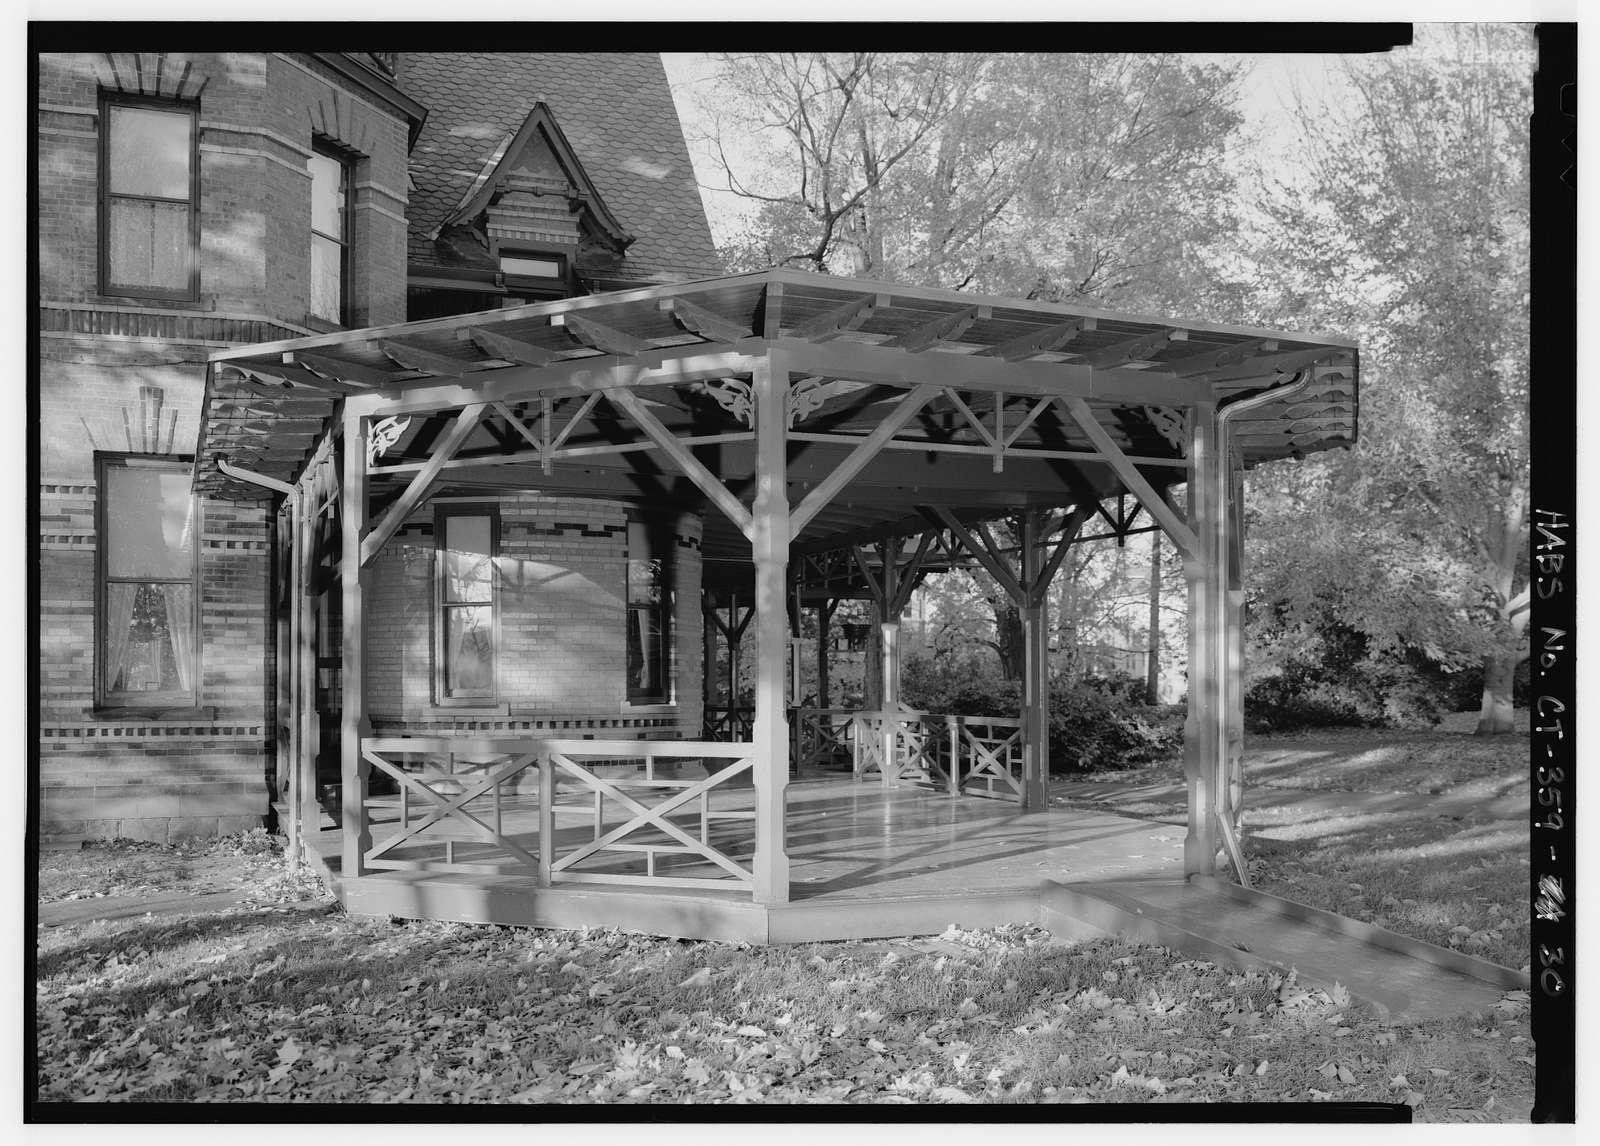 Mark Twain House, 351 Farmington Avenue (corrected from original address of 531 Farmington Avenue), Hartford, Hartford County, CT